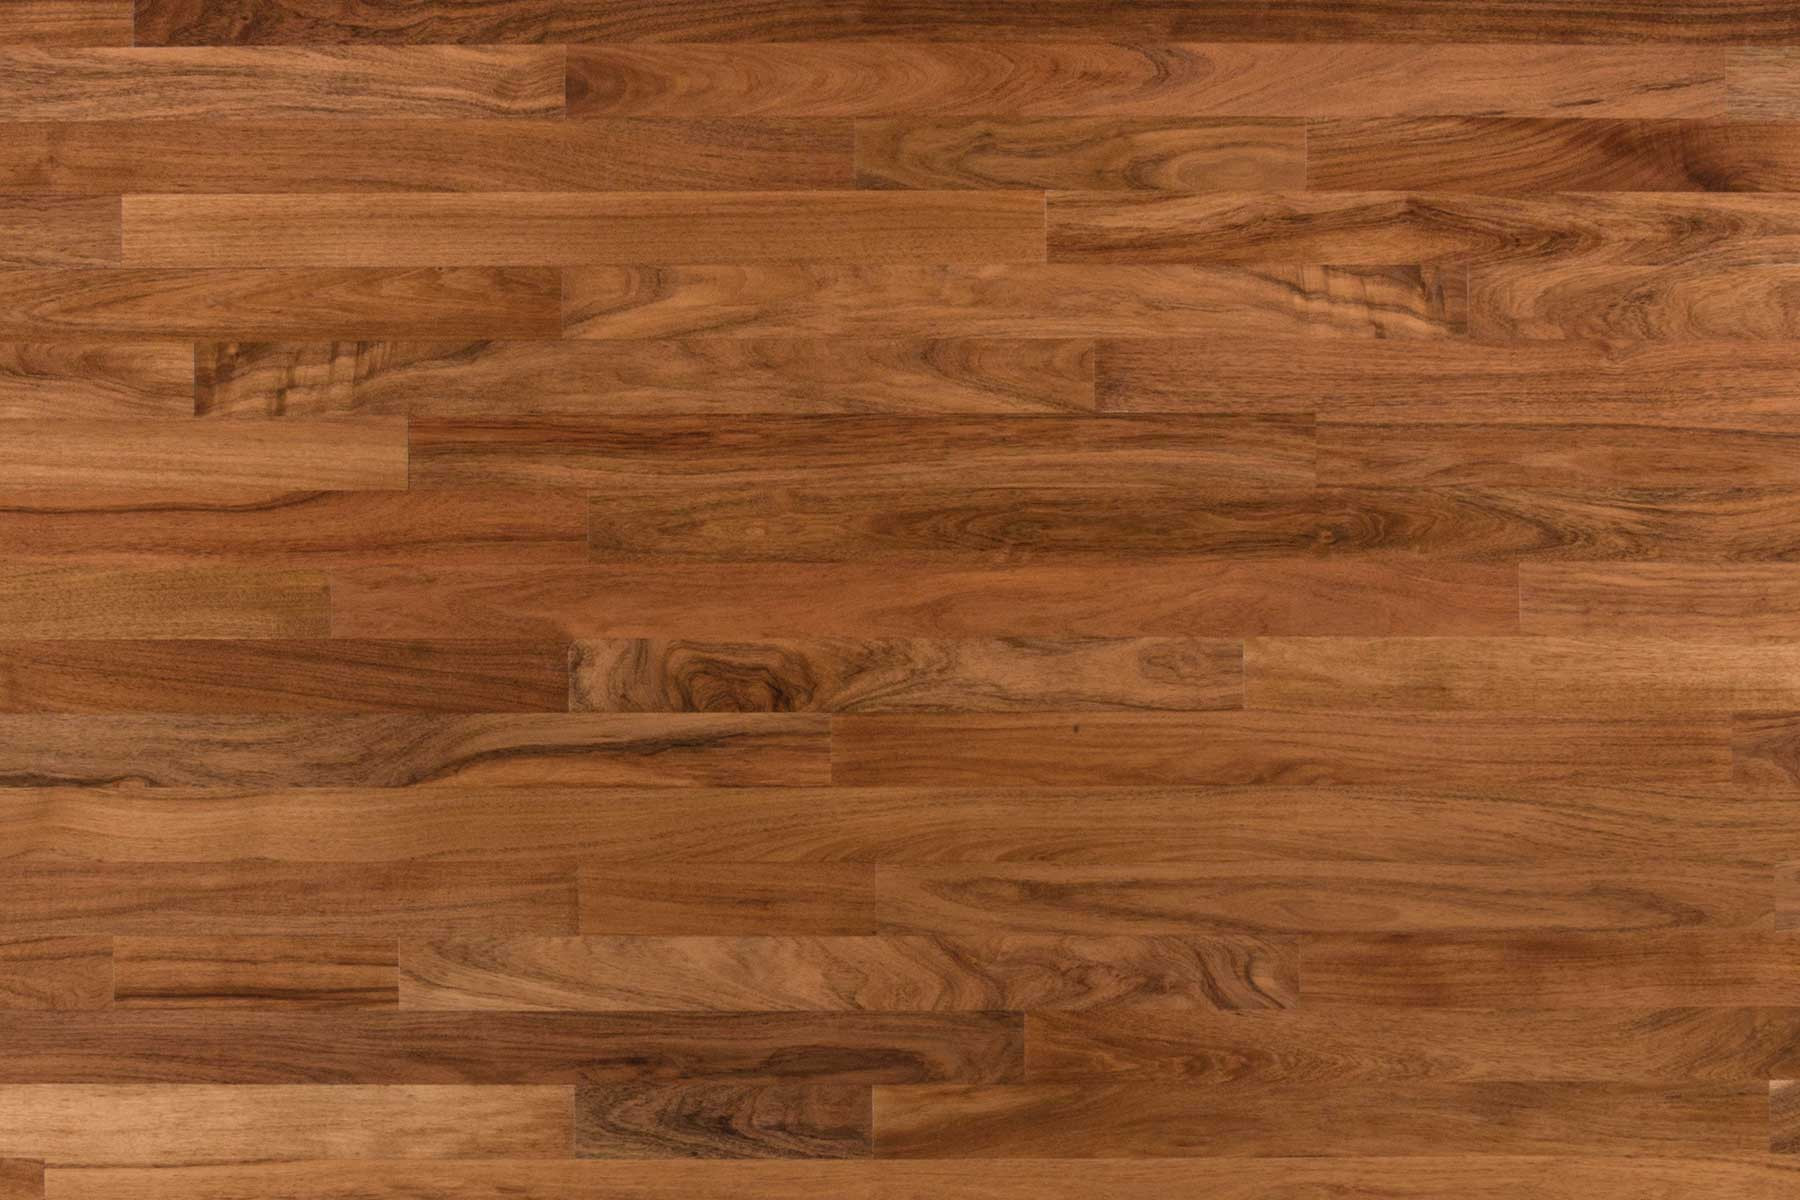 character grade walnut hardwood flooring of 3 natural caribbean walnut regarding 2b6a6d87 3a6f 4060 8859 38b6aca702af